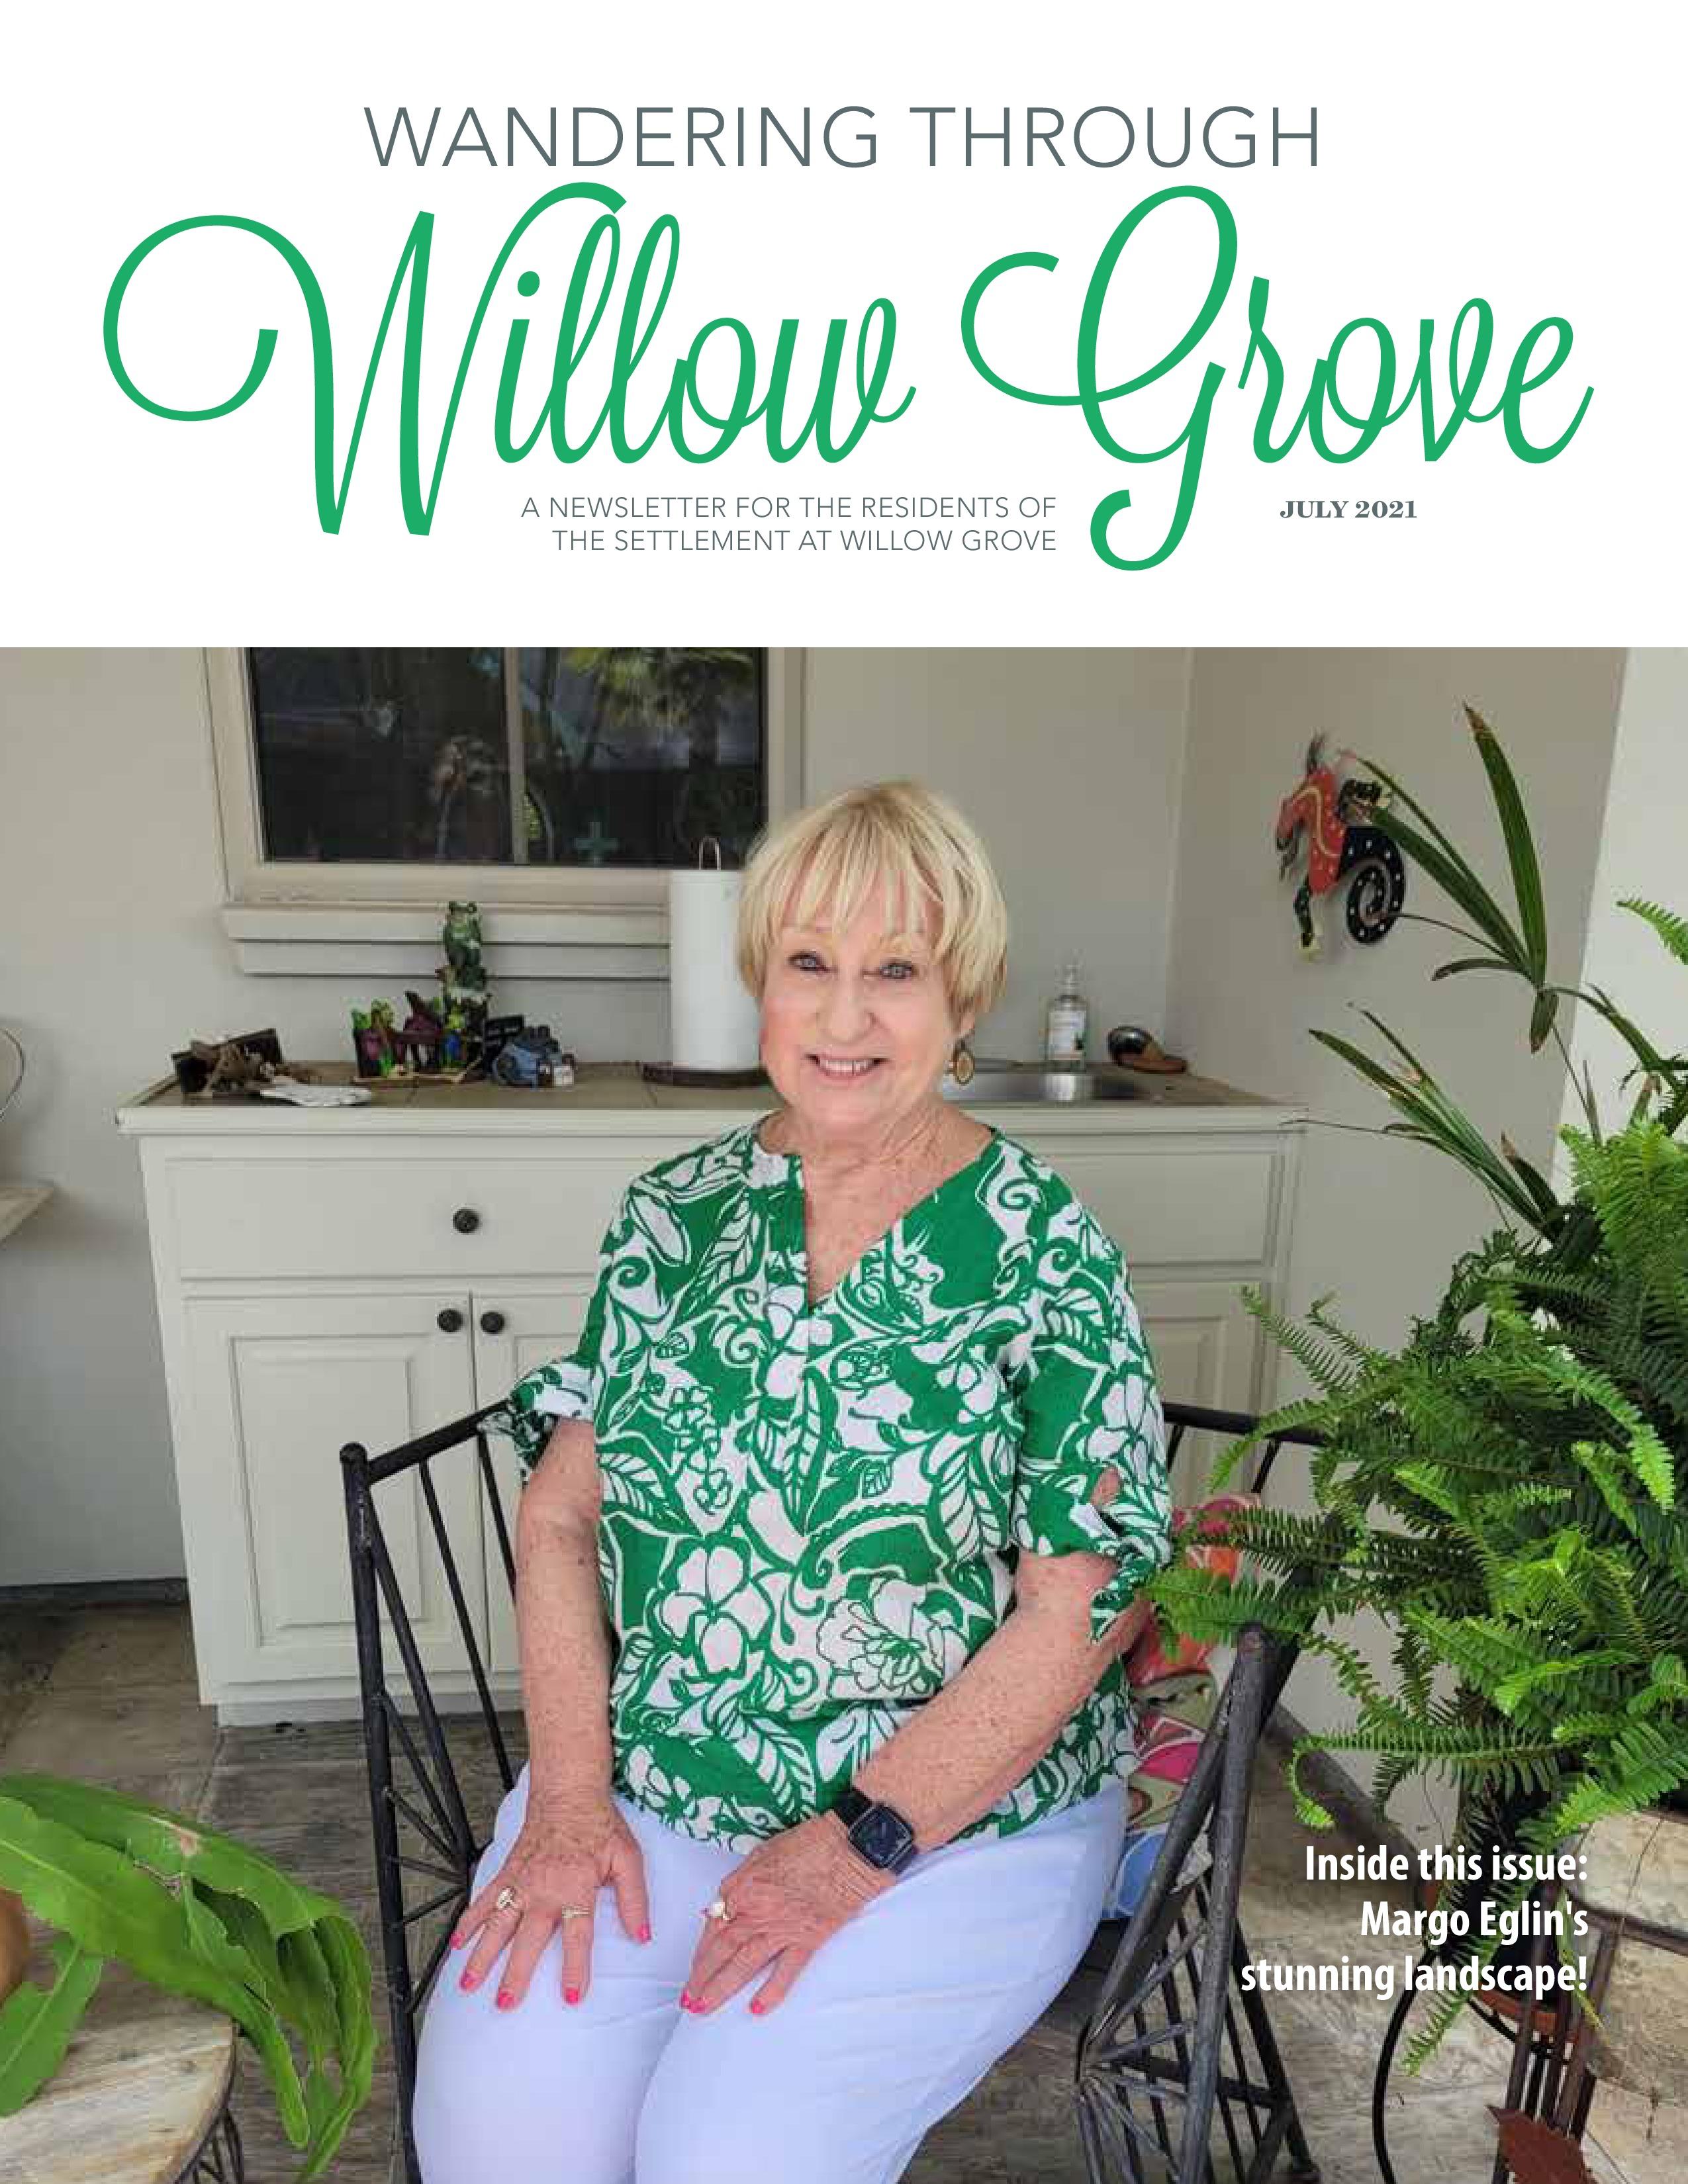 Wandering Through Willow Grove 2021-07-01